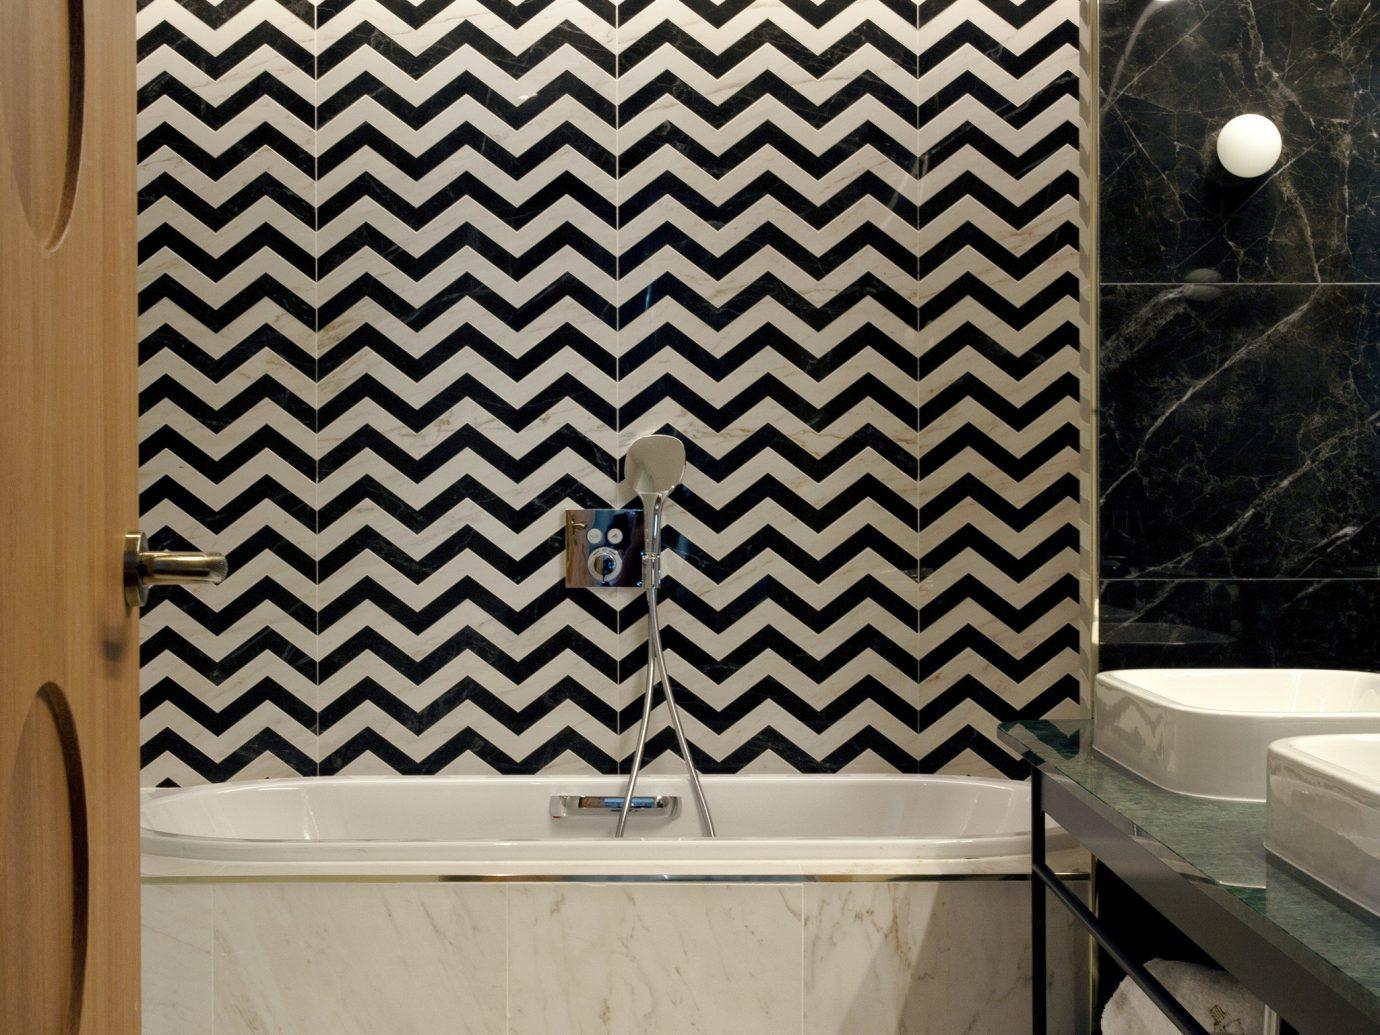 Hotels Madrid Spain indoor room bathroom wall tile interior design Architecture floor ceiling flooring daylighting angle